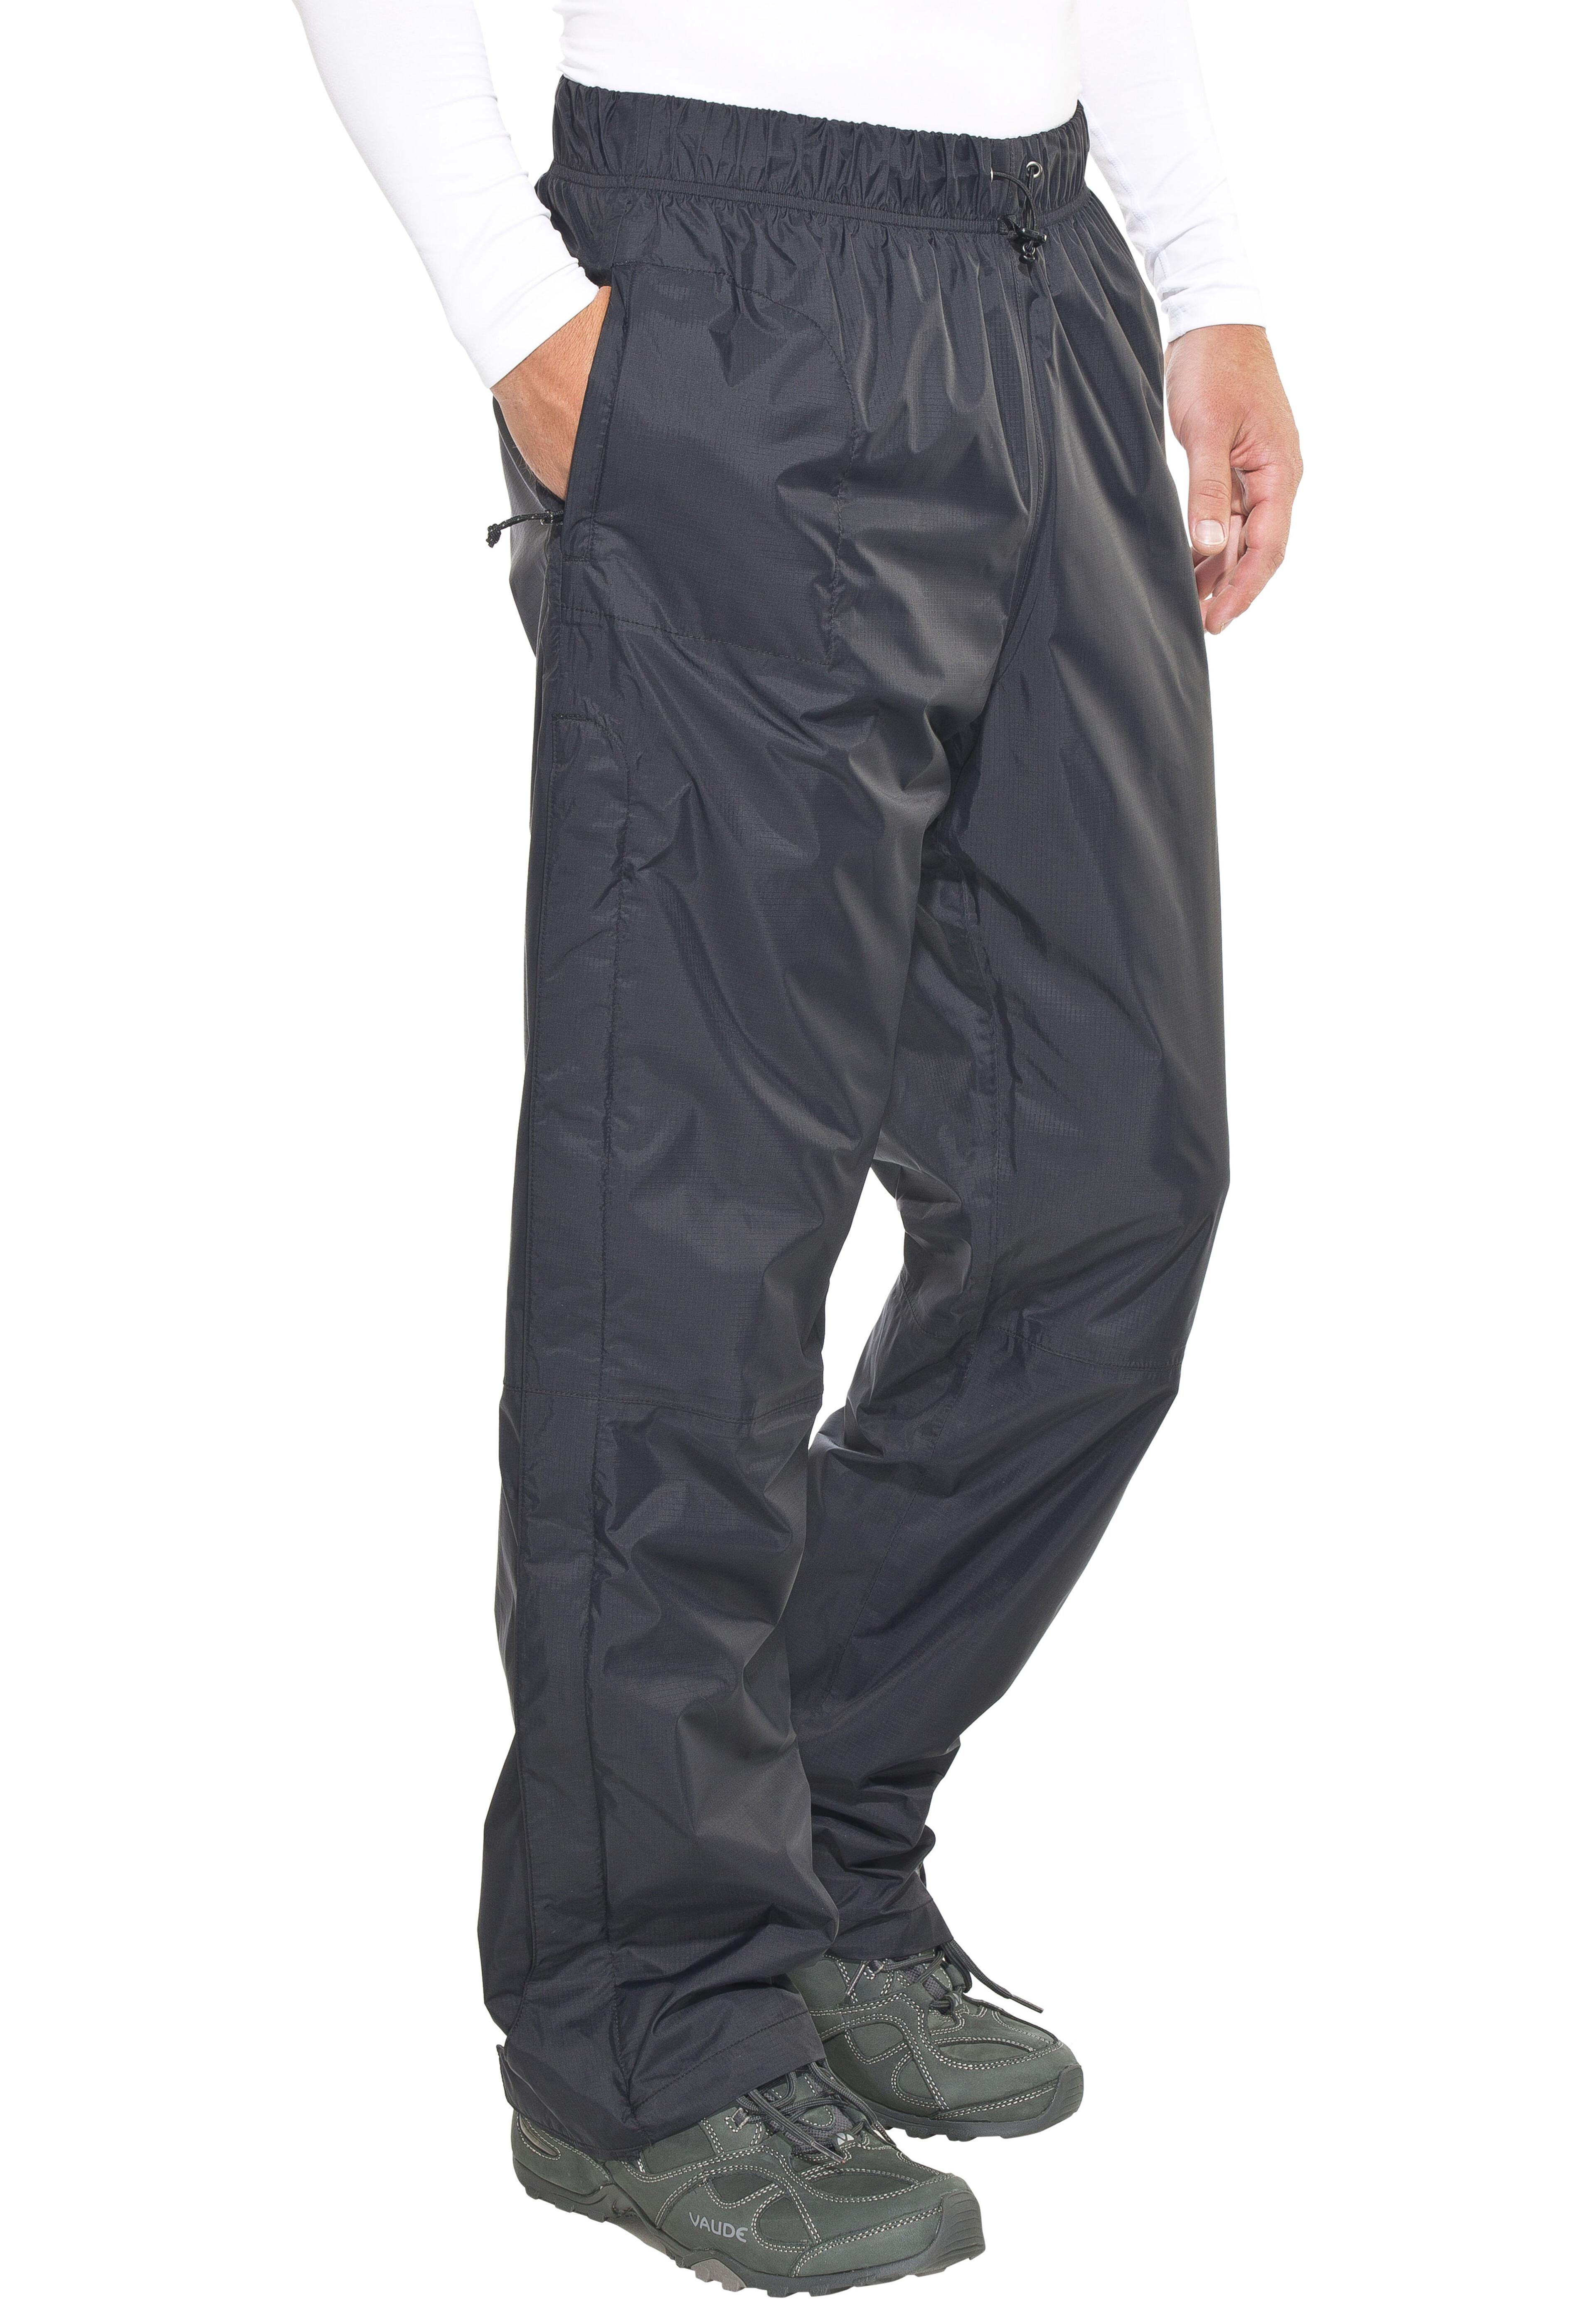 Columbia Pouring Adventure - Pantalones de Trekking Hombre - 81 cm negro a95f1ab9031